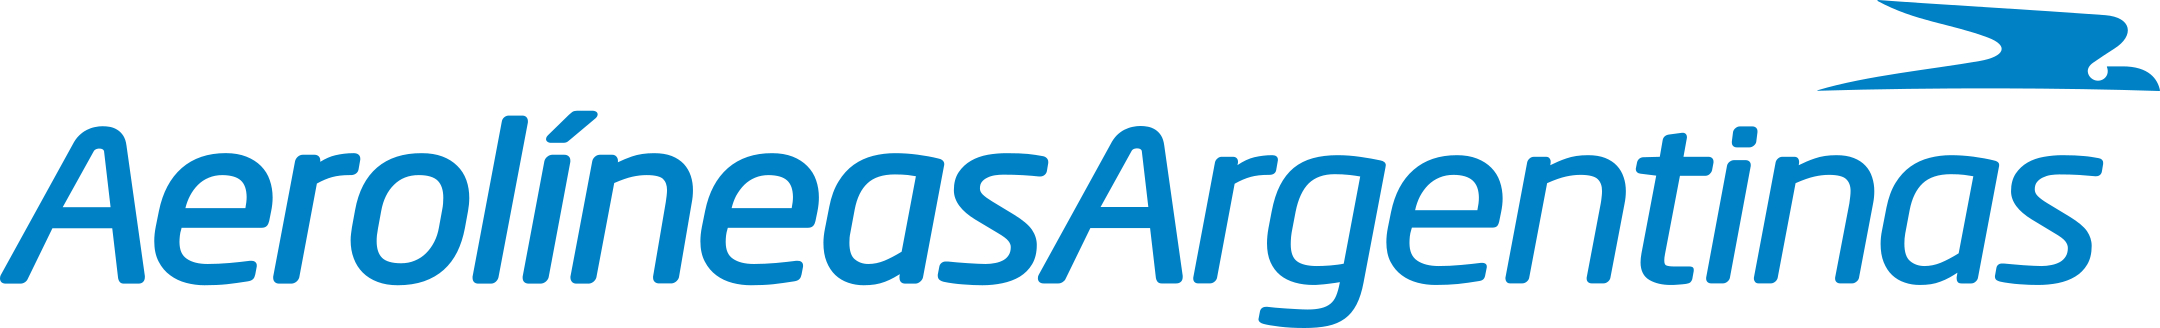 aero lineas argentinas logo 1 - Aerolíneas Argentinas Logo